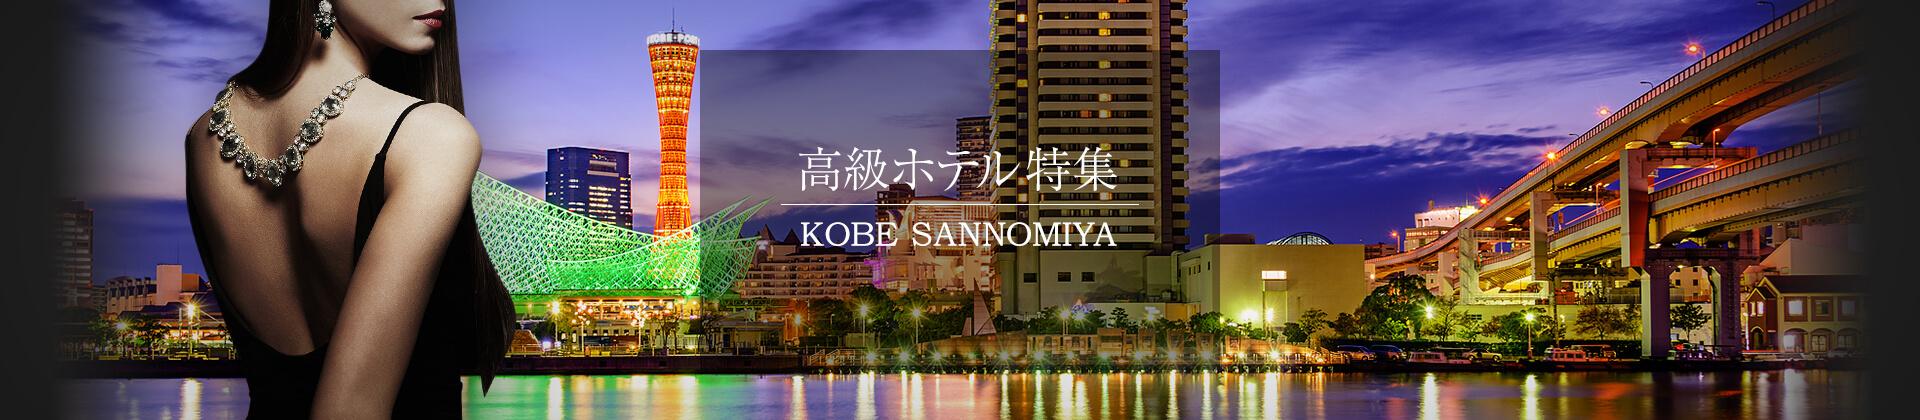 高級ホテル特集 (神戸・三宮)